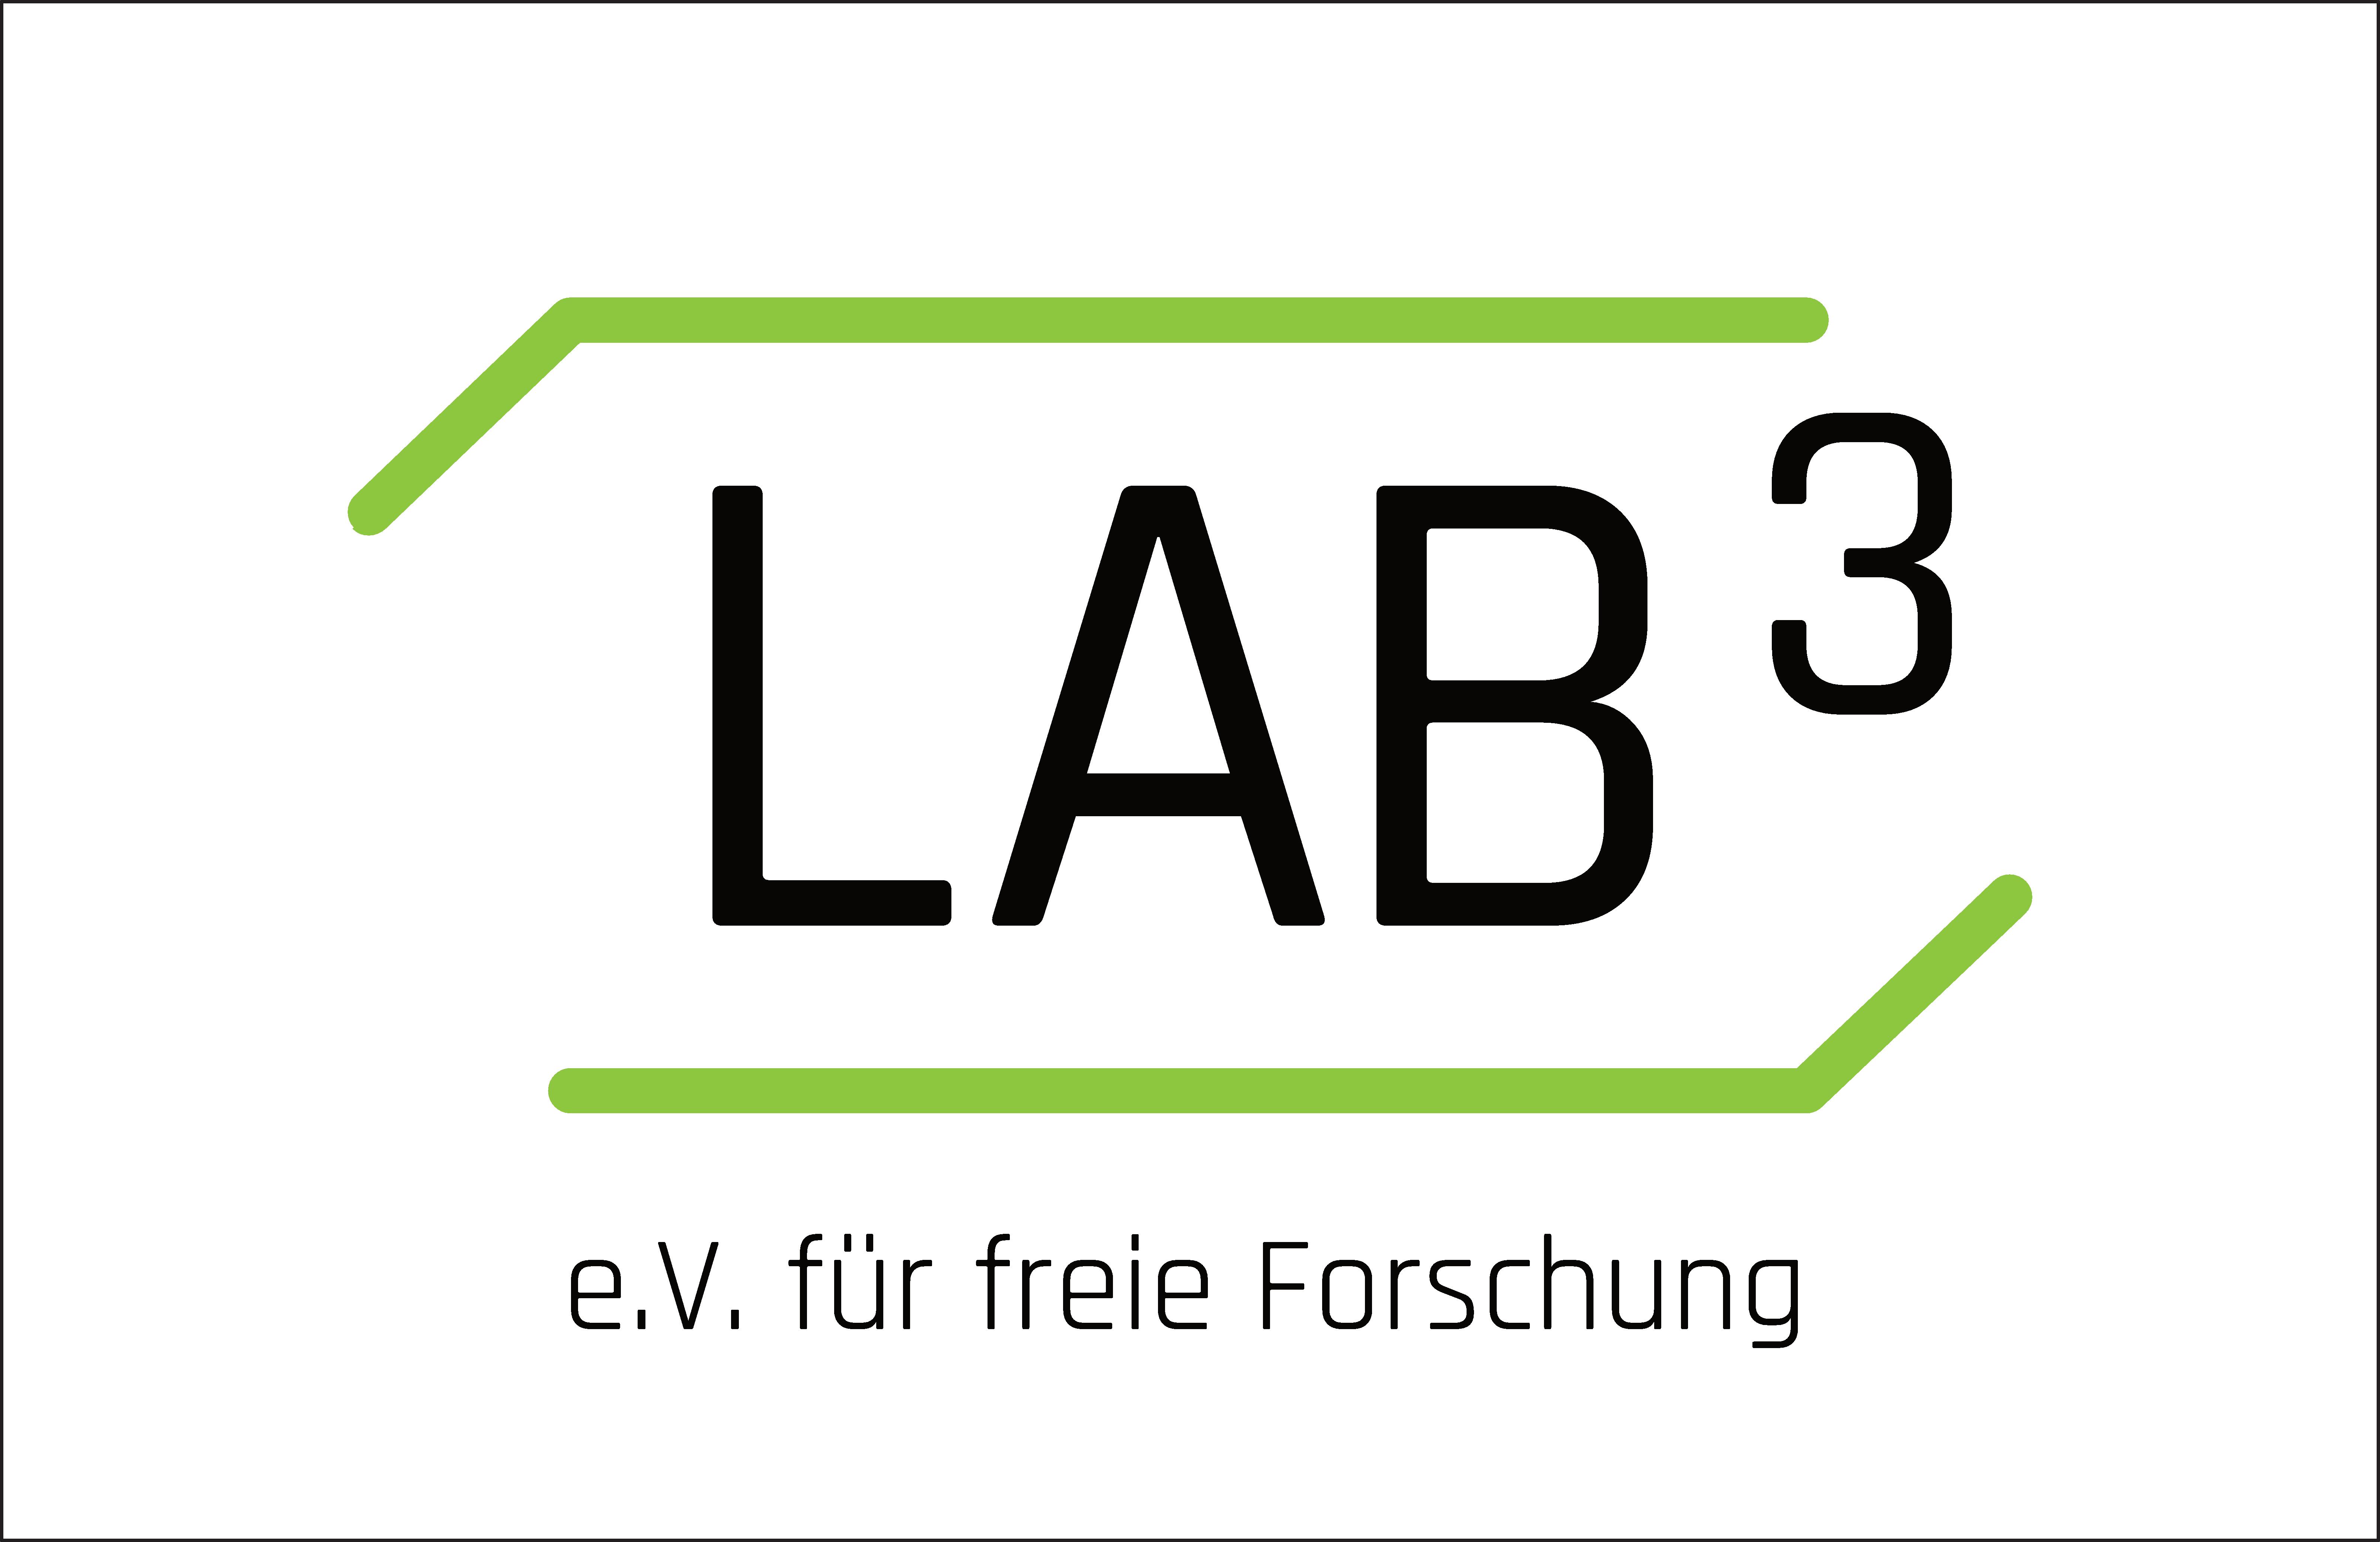 LAB3.org